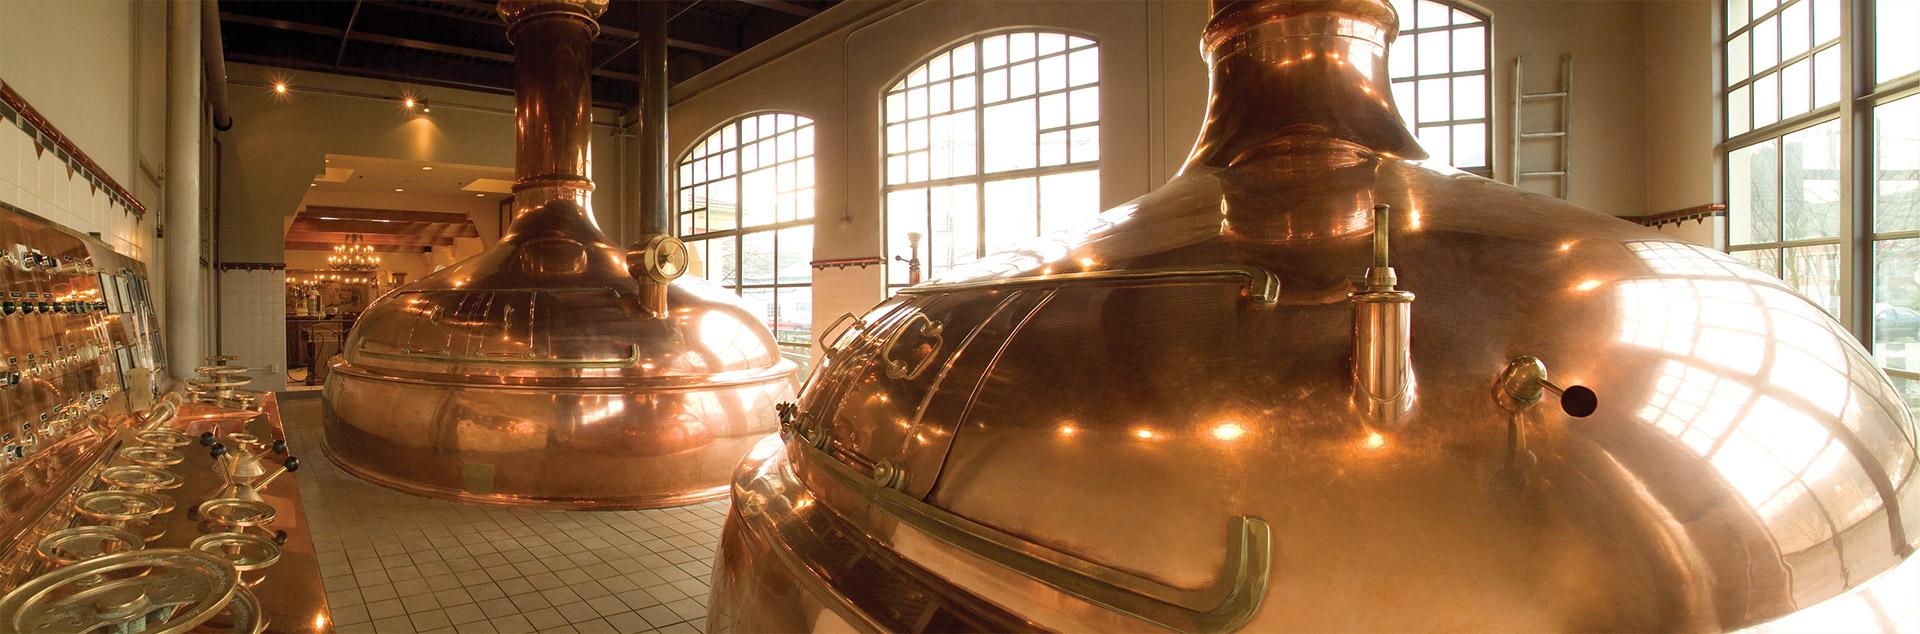 Portland Brewery Kettles